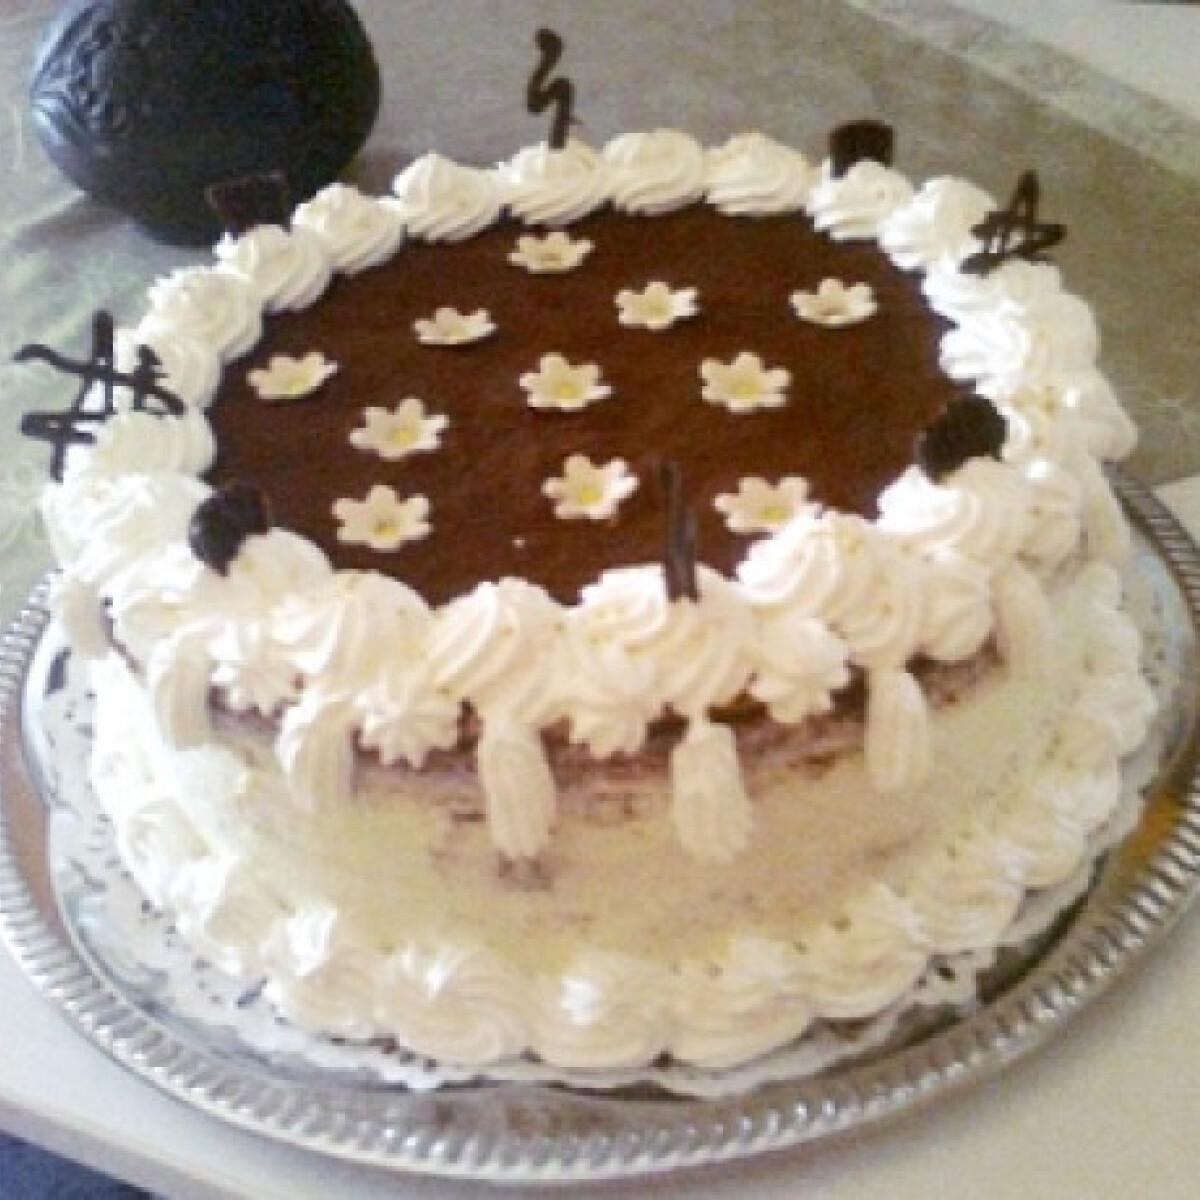 Ezen a képen: Hamis tiramisu torta Angica módra